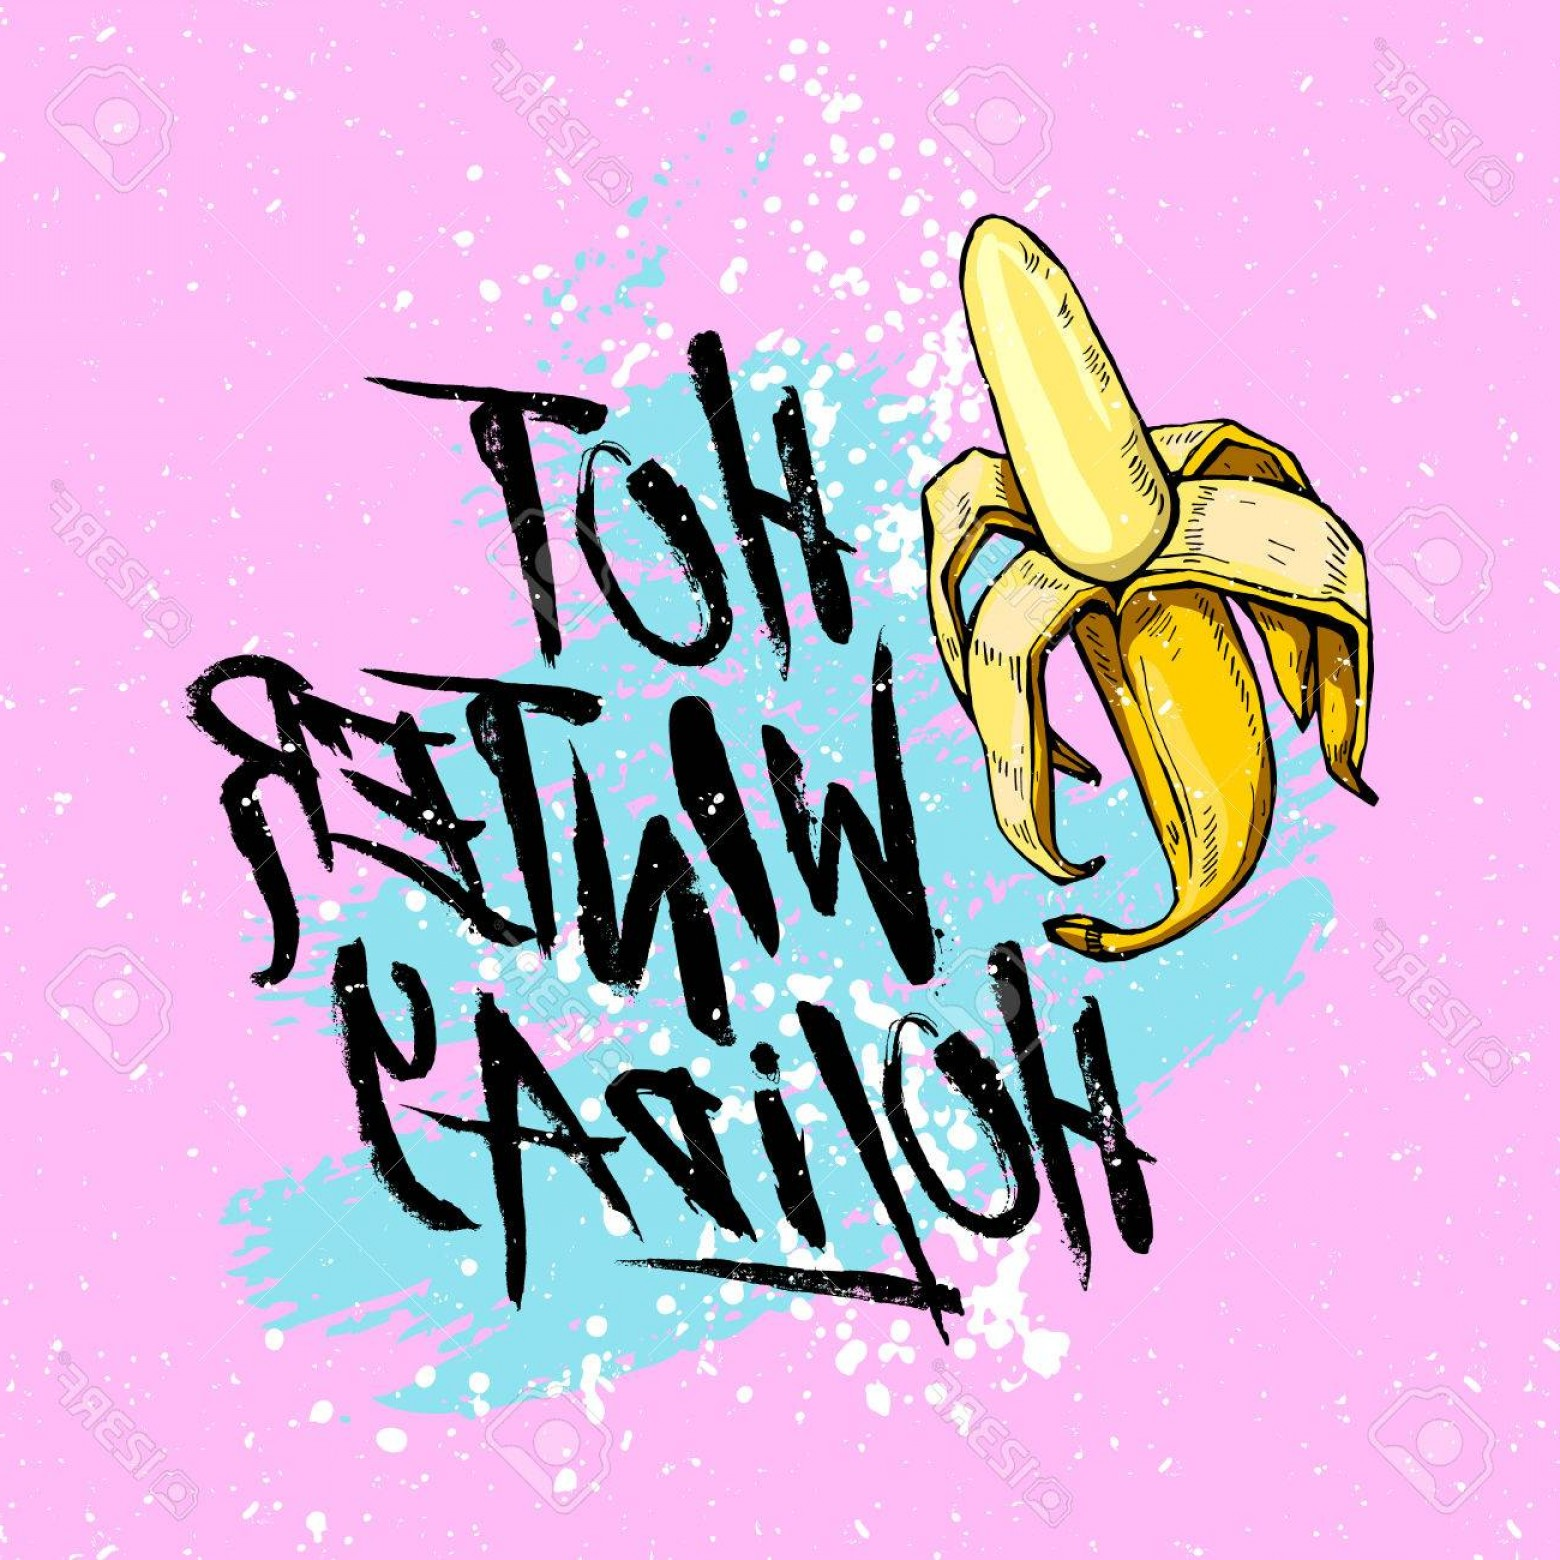 1560x1560 Photostock Vector Illustration Hot Winter Holiday With Banana On A